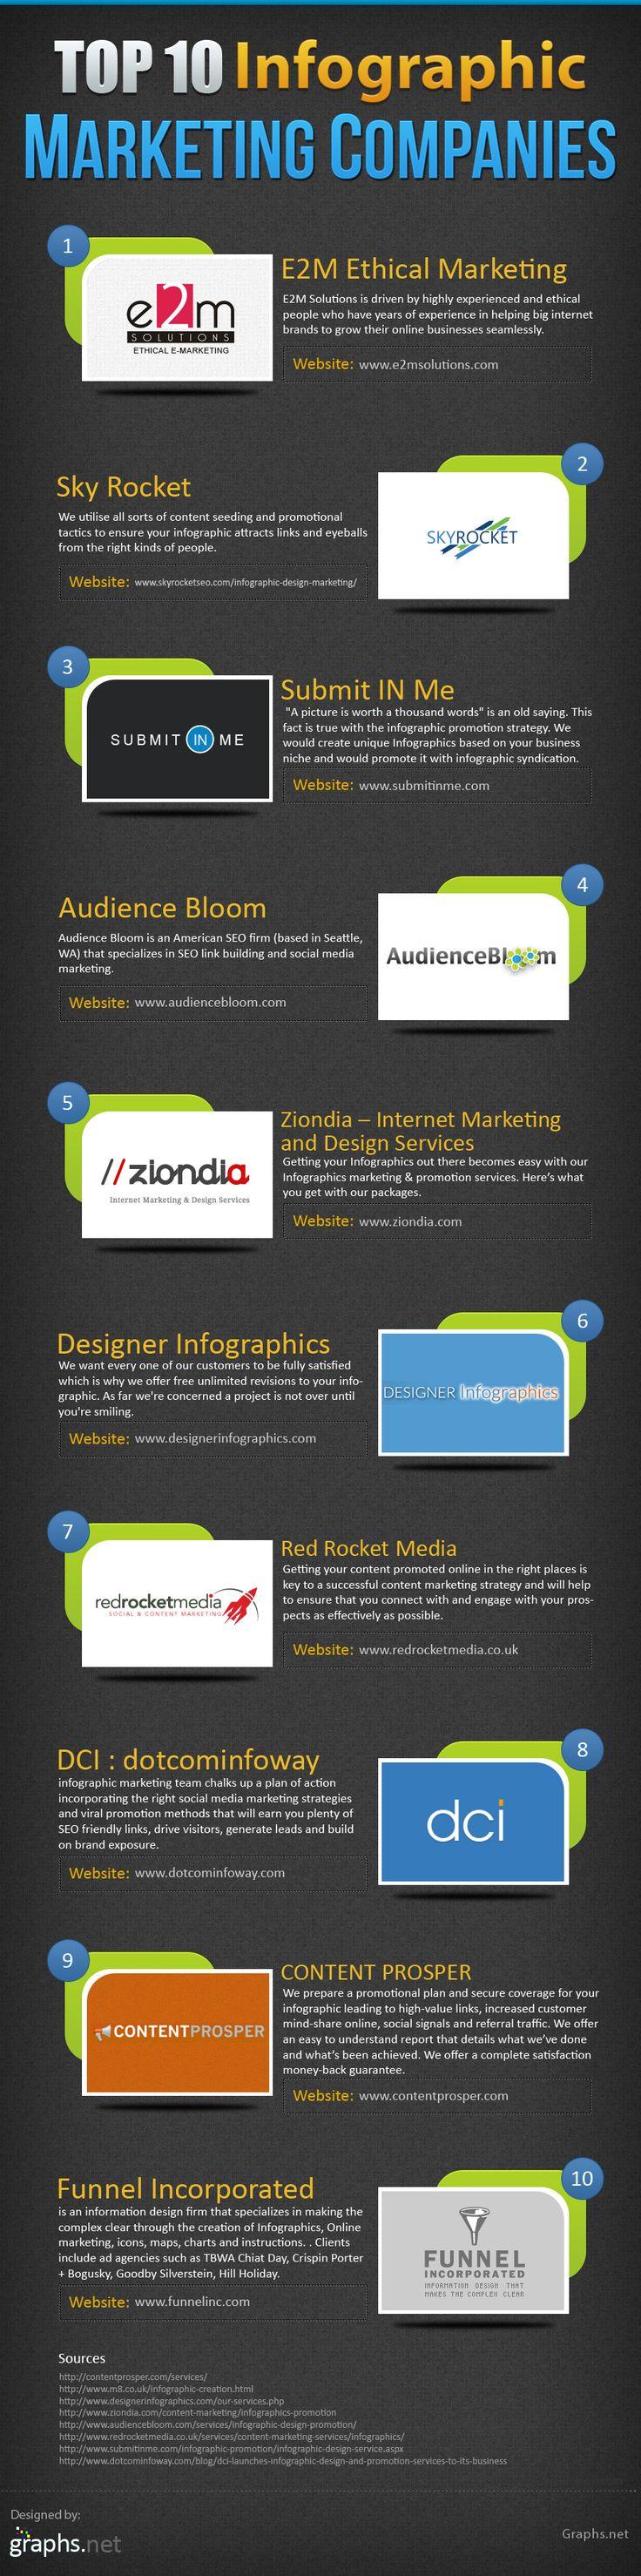 Top 10 Infographic Marketing Companies